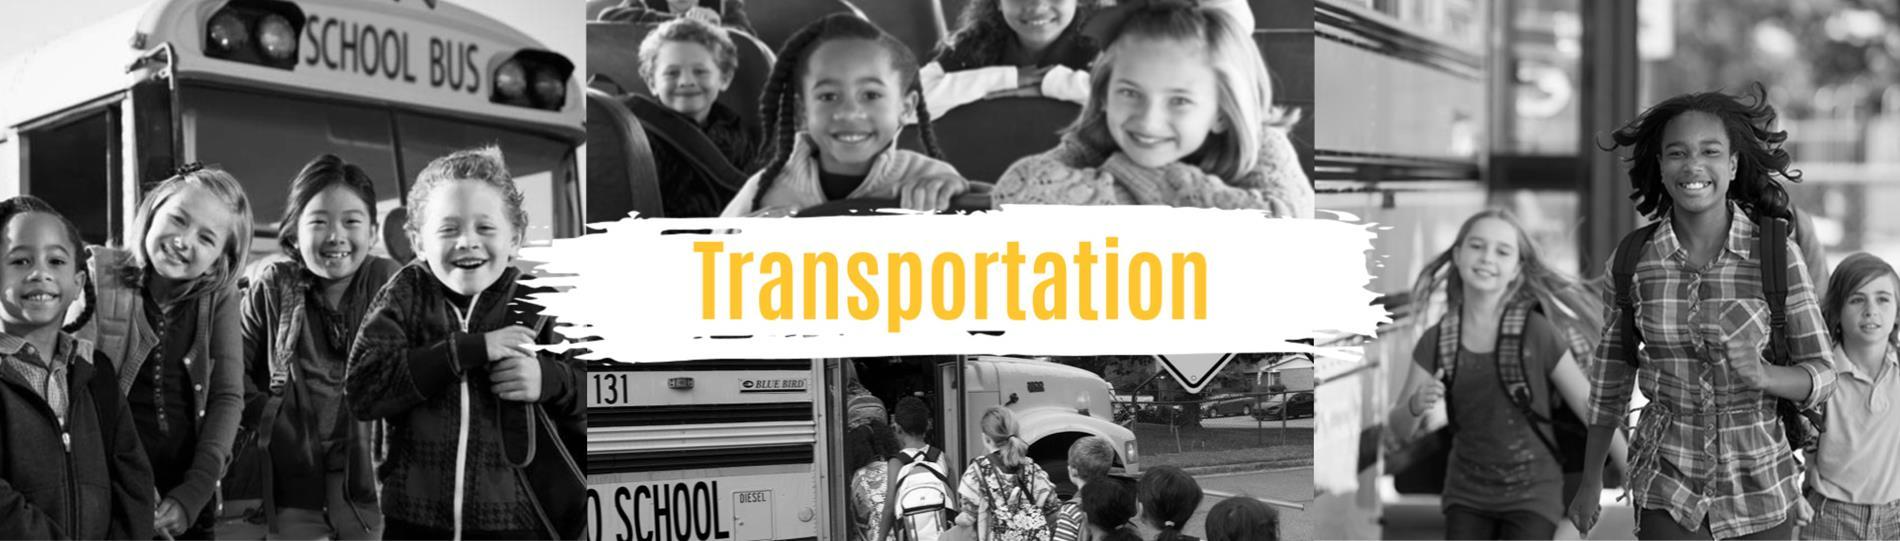 Transportation Banner